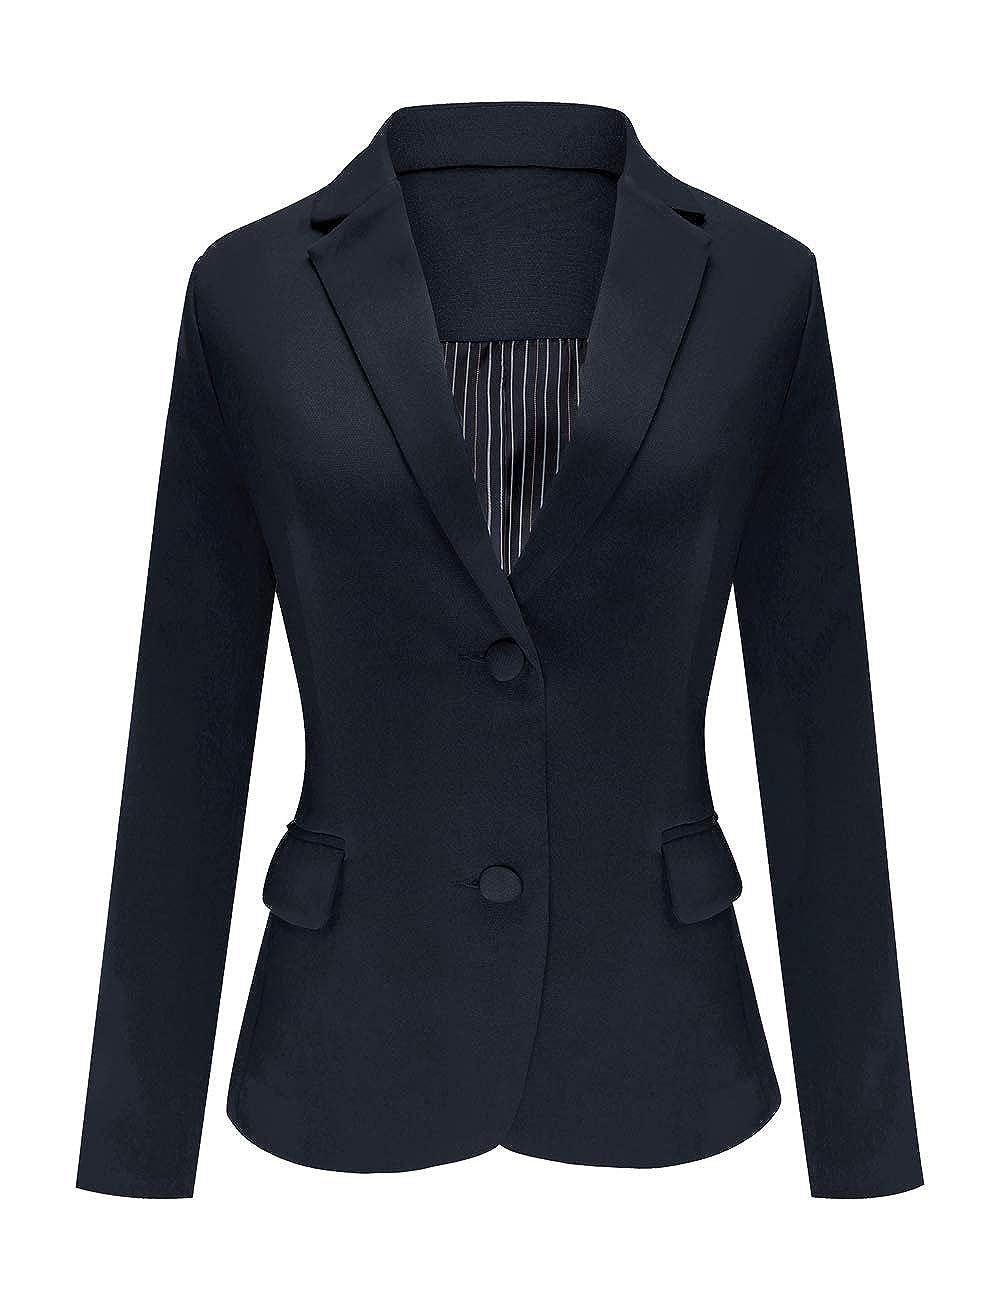 Navy bluee Luyeess Women's Casual Work Office Notch Lapel Pocket Buttons Blazer Suit Jacket